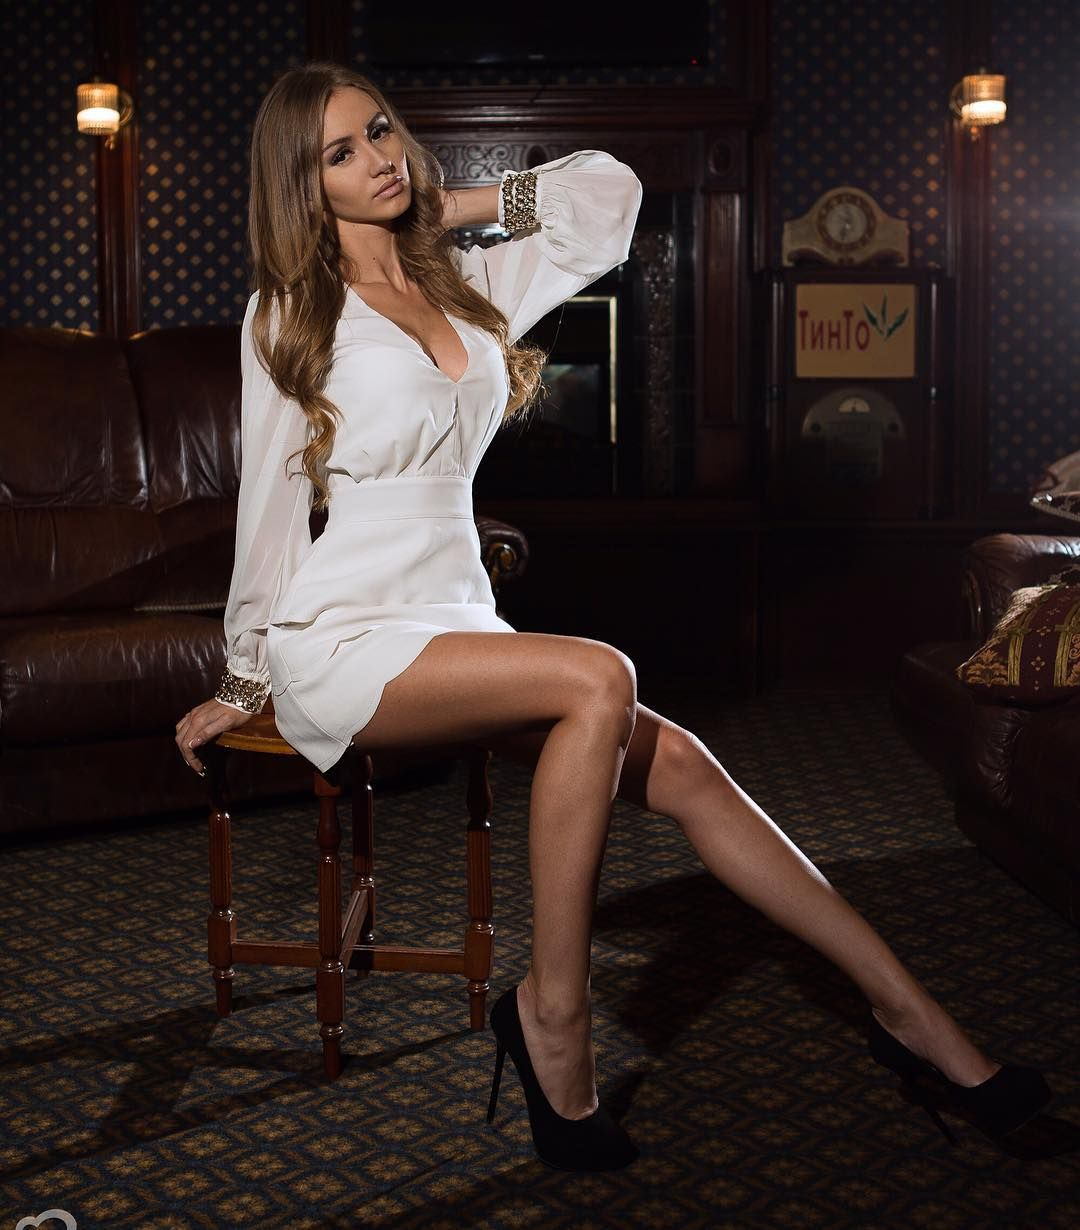 Valentina Grishko Sexy Sitting Pinterest Legs And